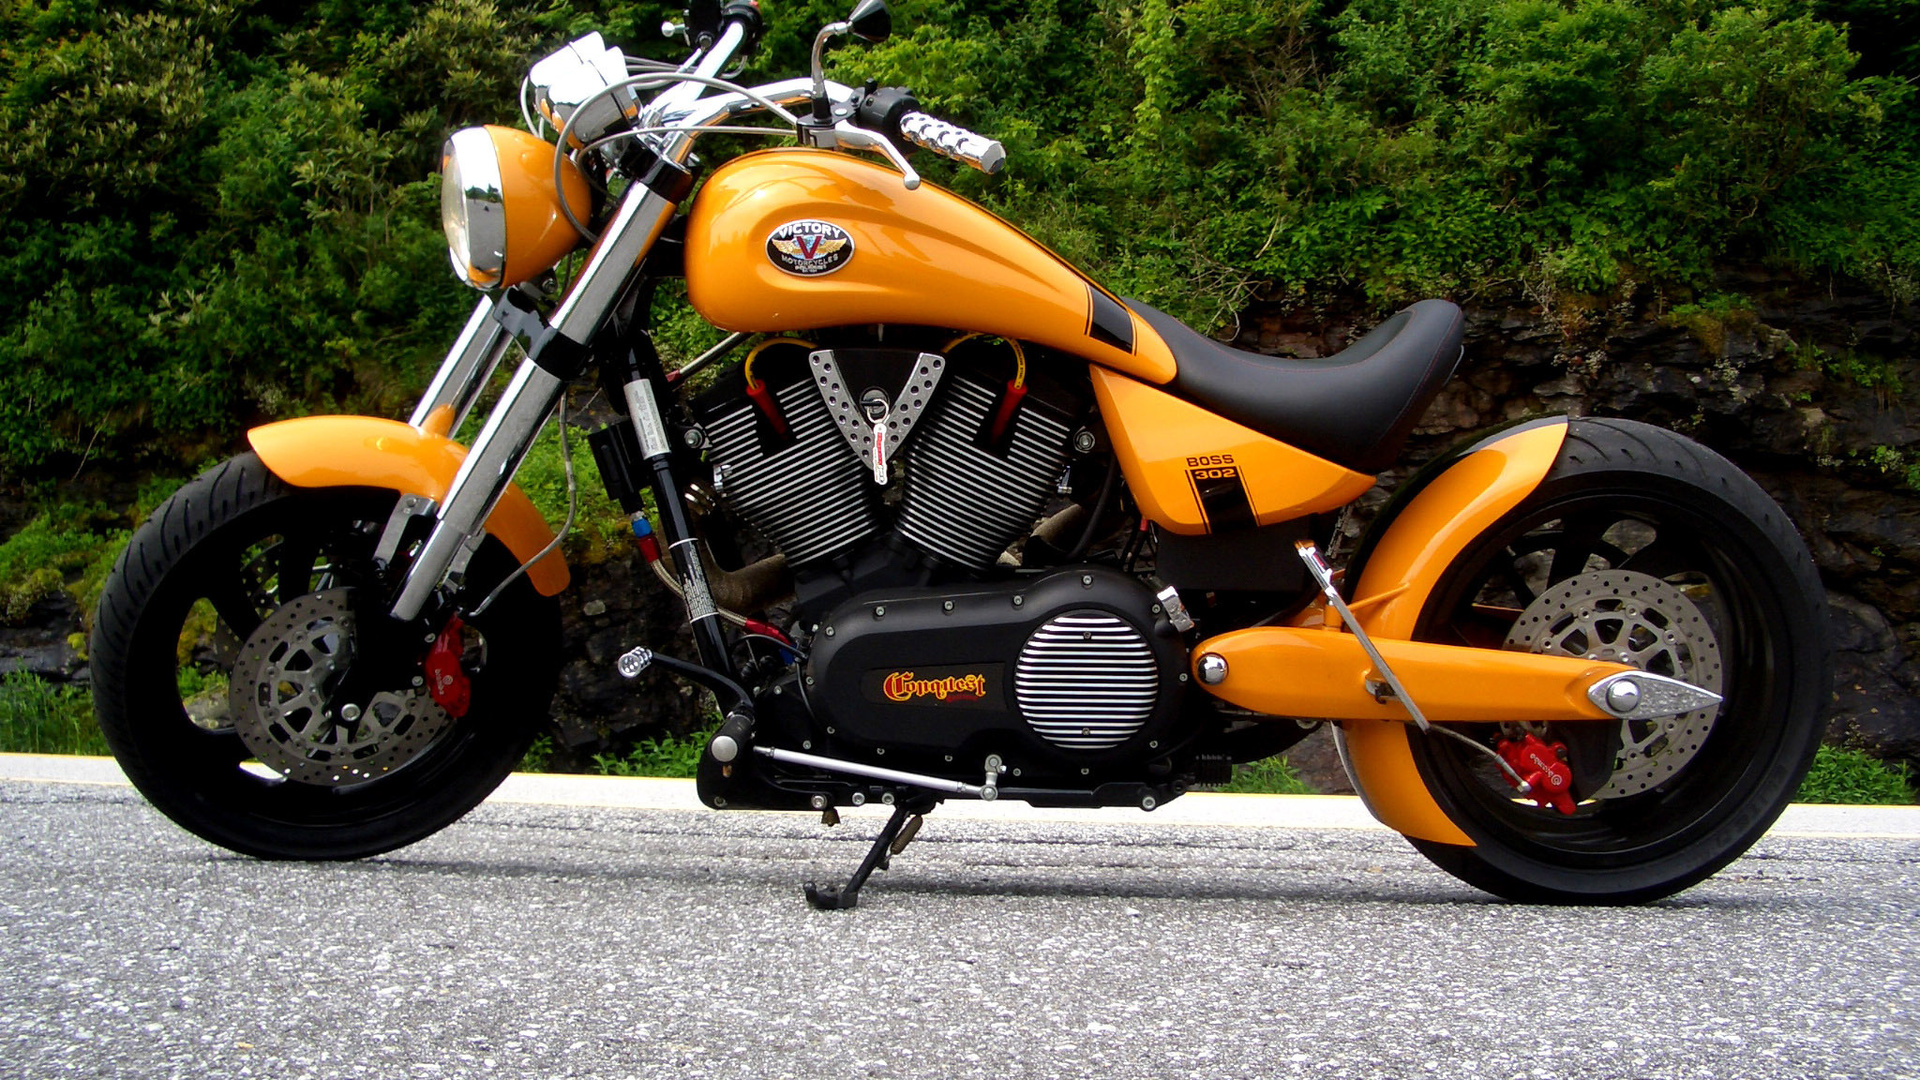 картинки байки мотоциклы фото доме представлены